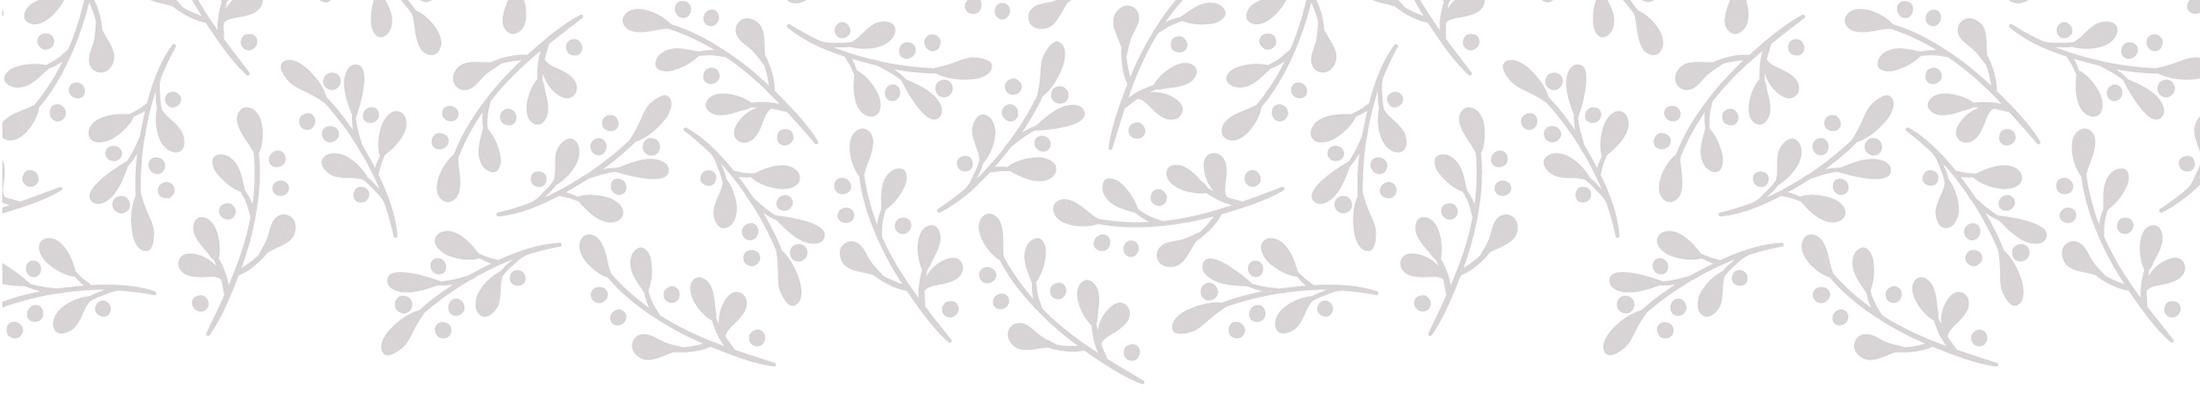 holiday-berry-wall-decal-sputnik-design-partners-toronto-lcbo-pop-up.jpg